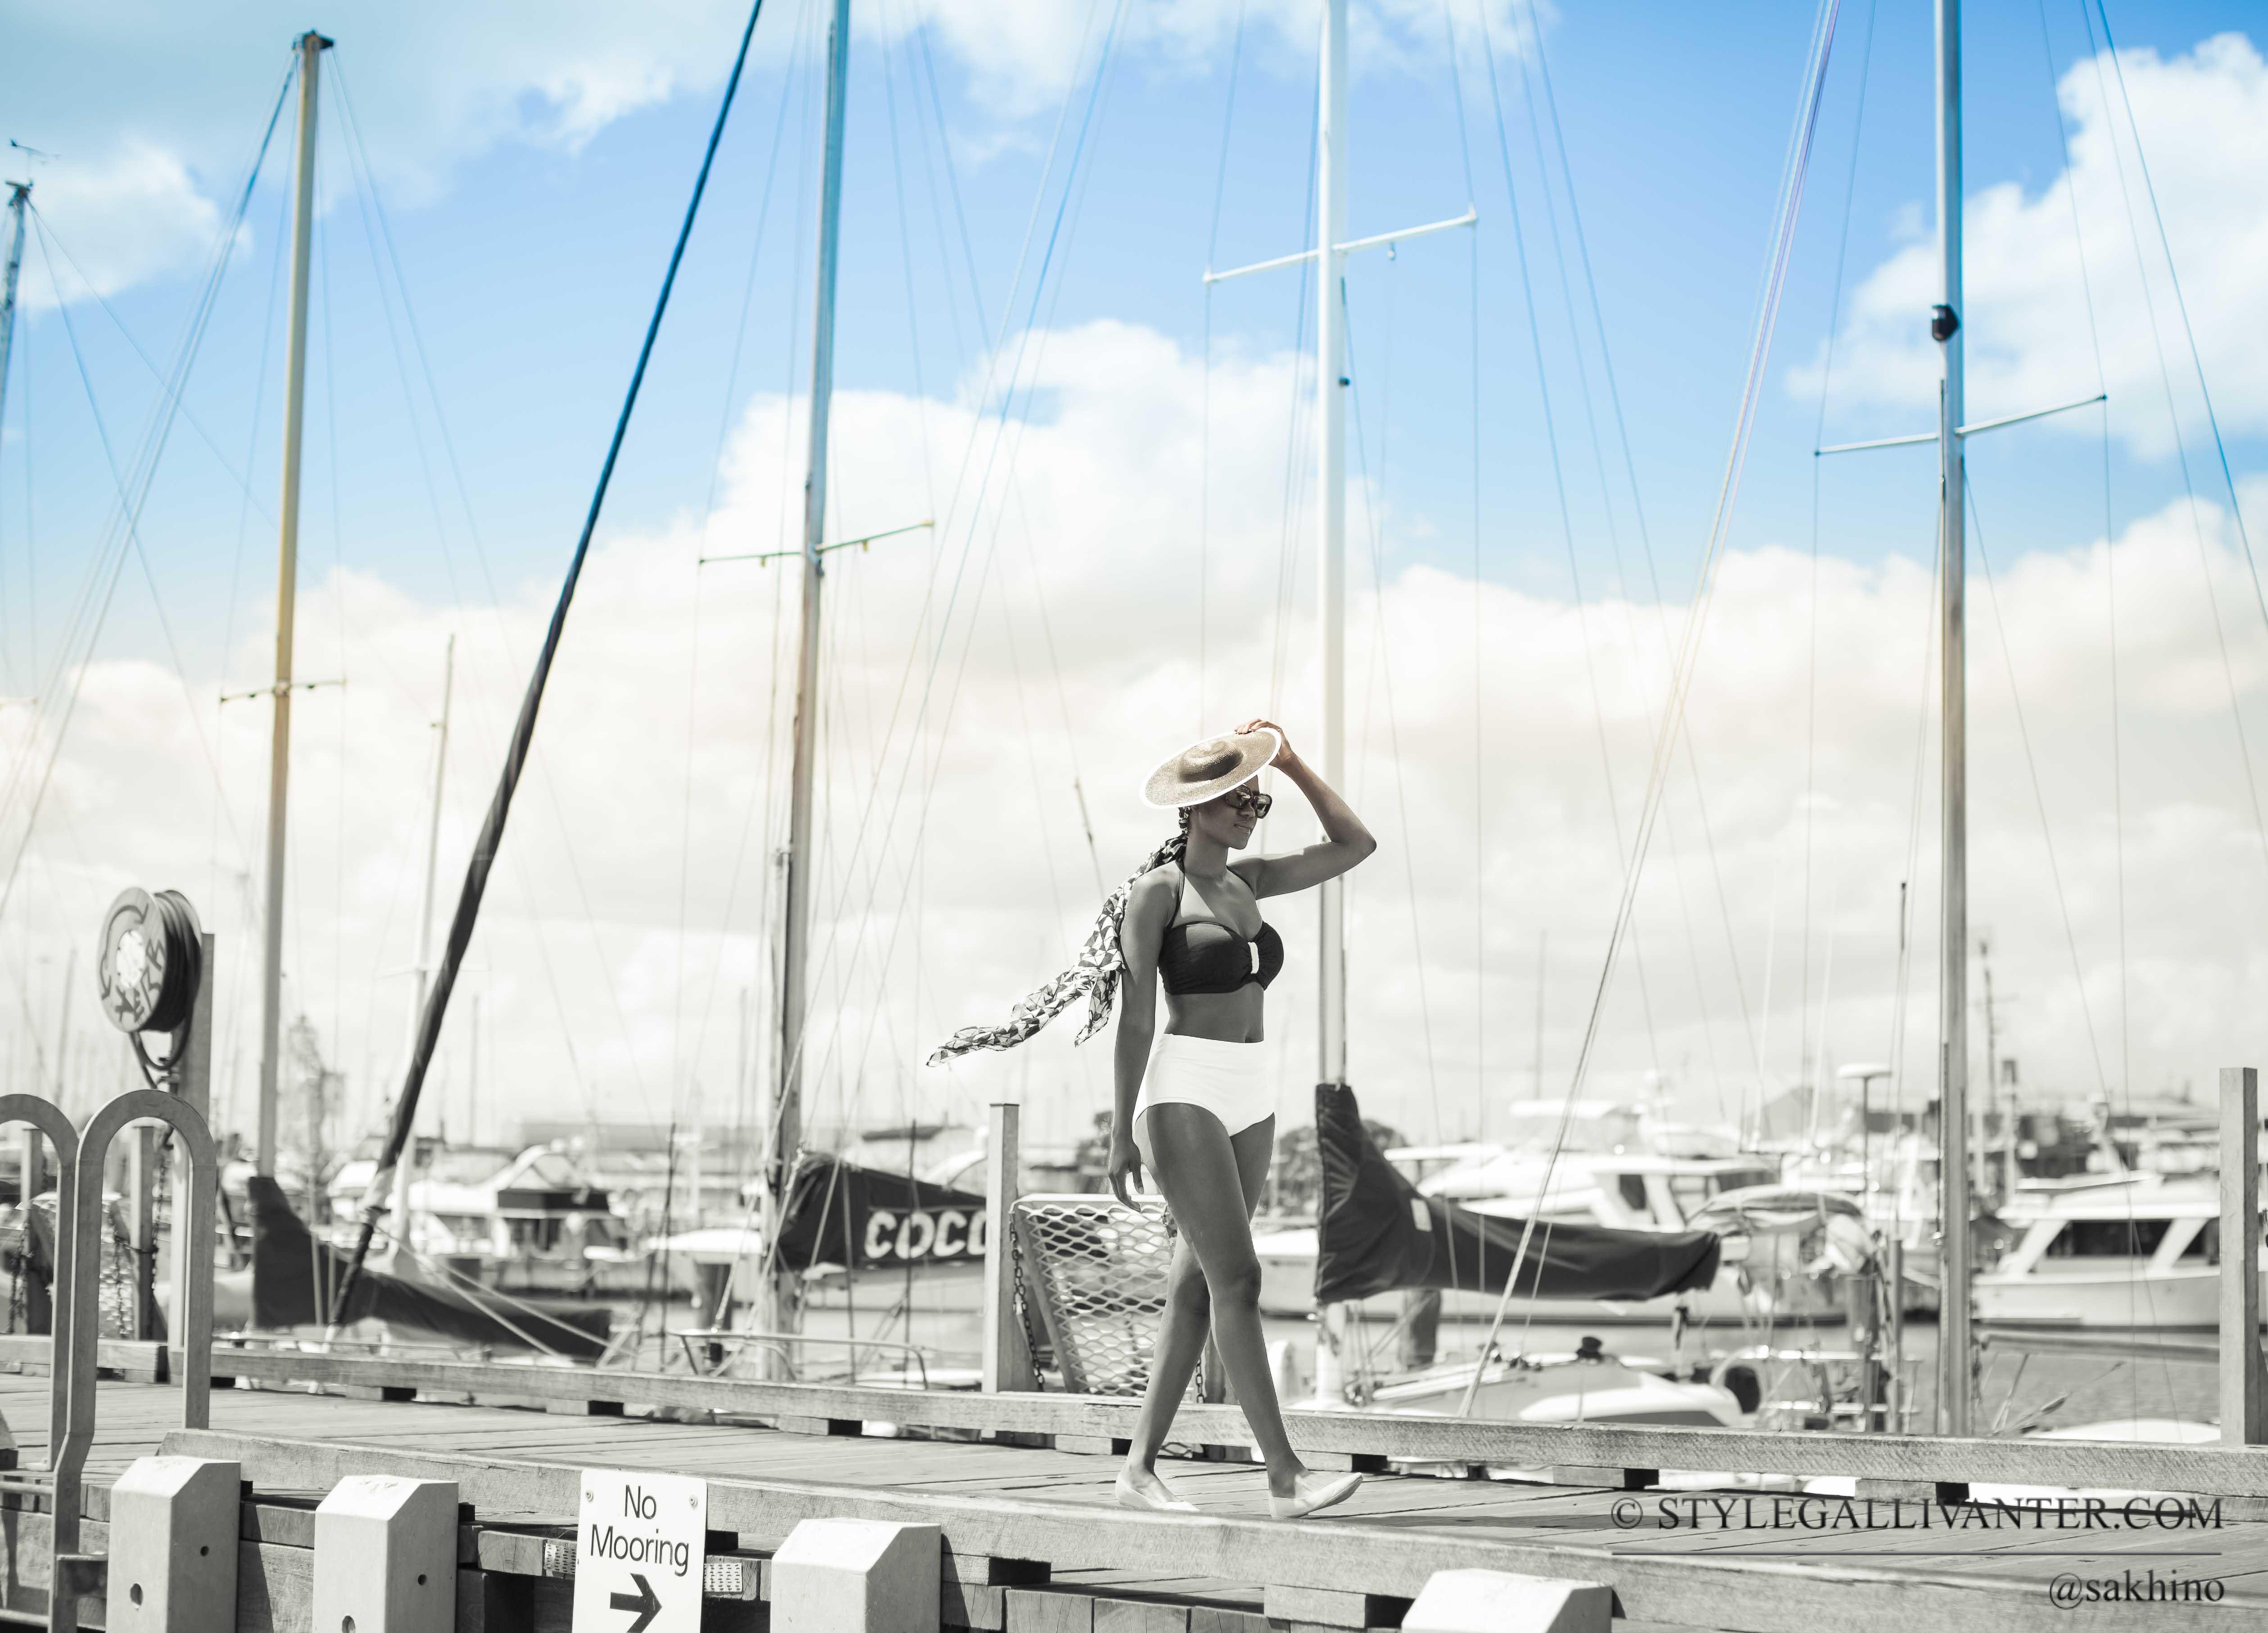 swimwear-trends-2015_top-models-melbourne_best-african-black-models-melbourne-australia_fashfest-models_surania_topfashion-blogs-africa-5